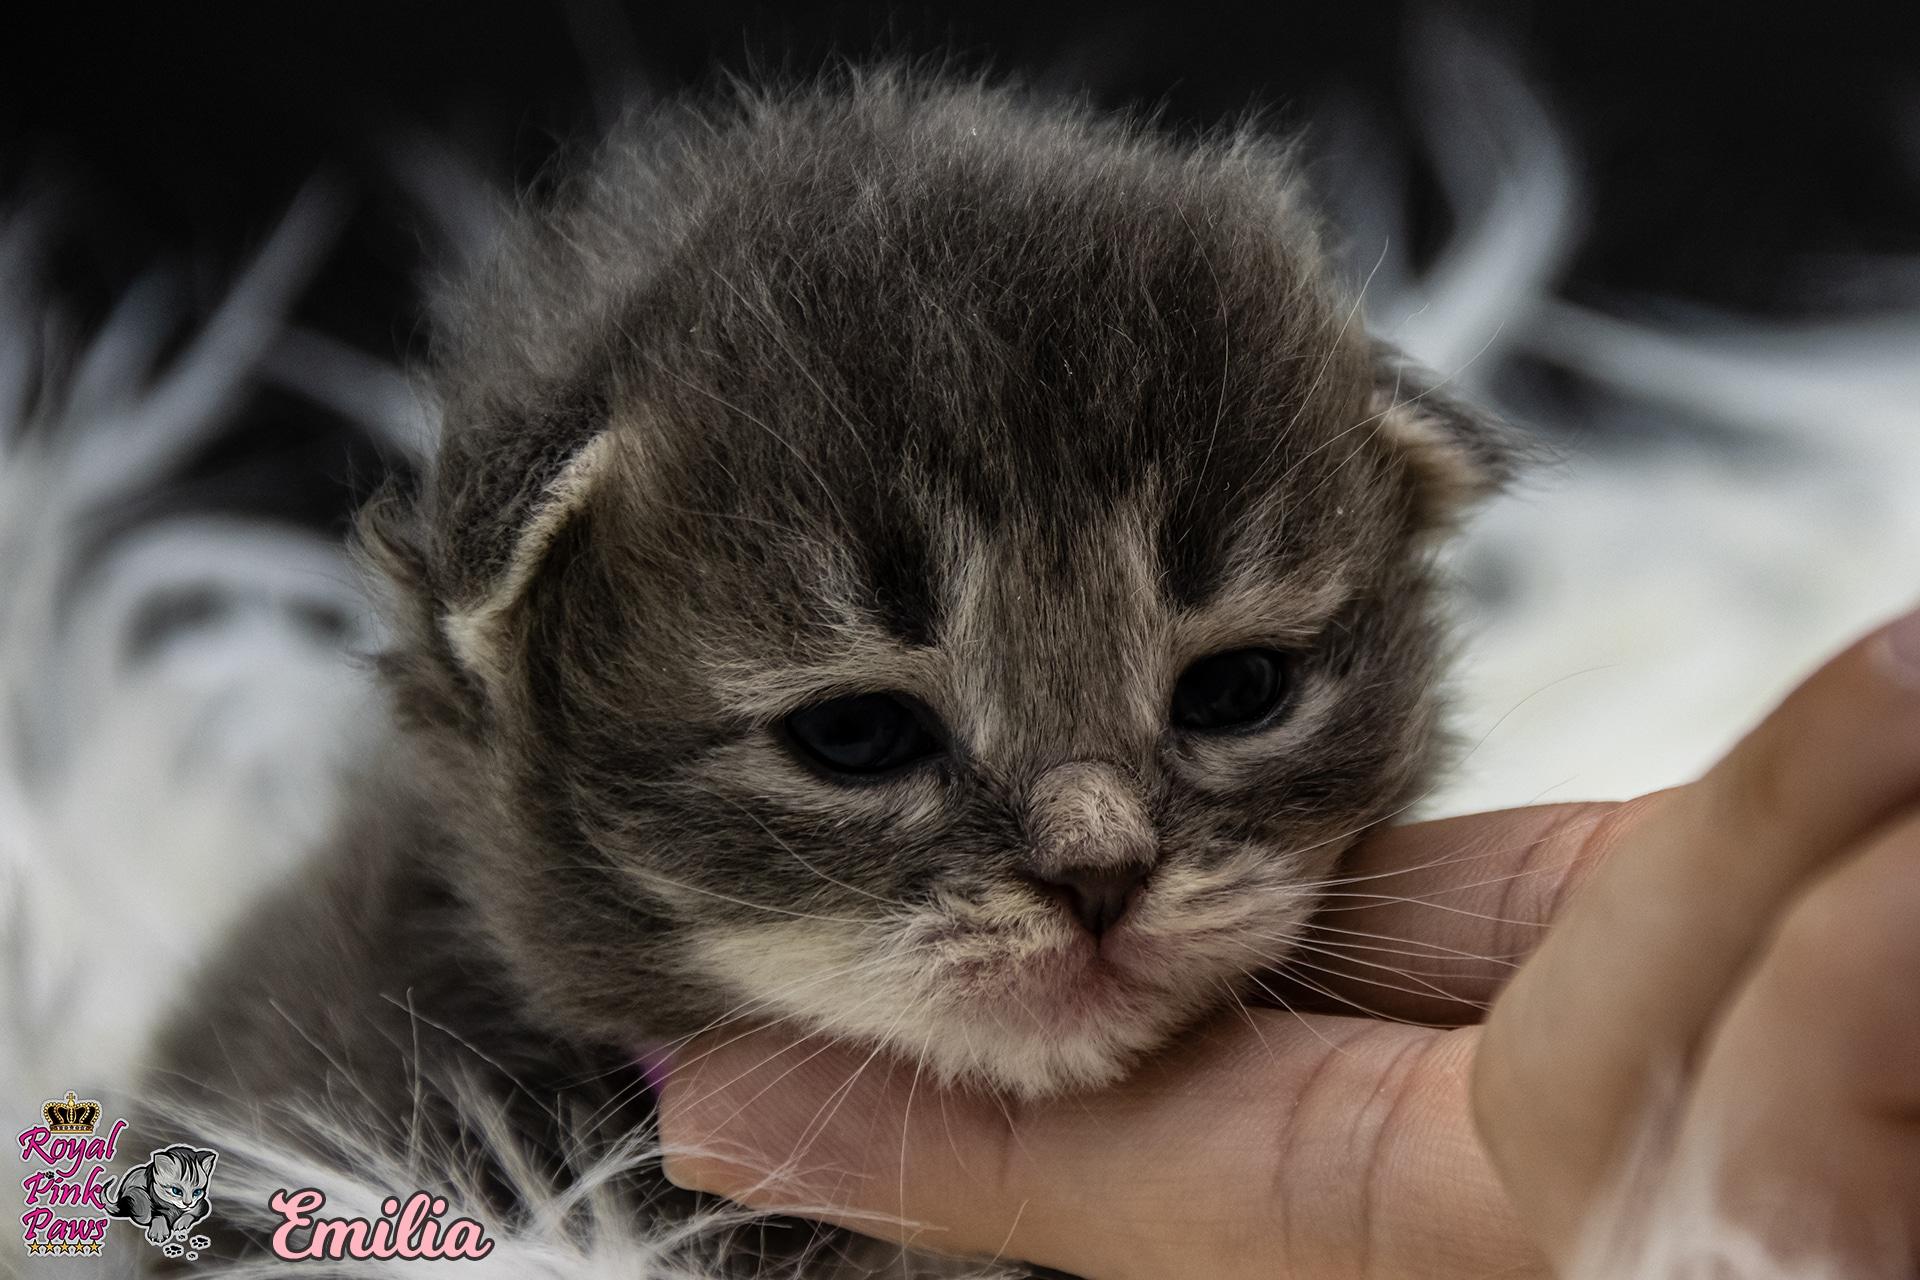 Sibirische Katze - Emilia Royal Pink Paws